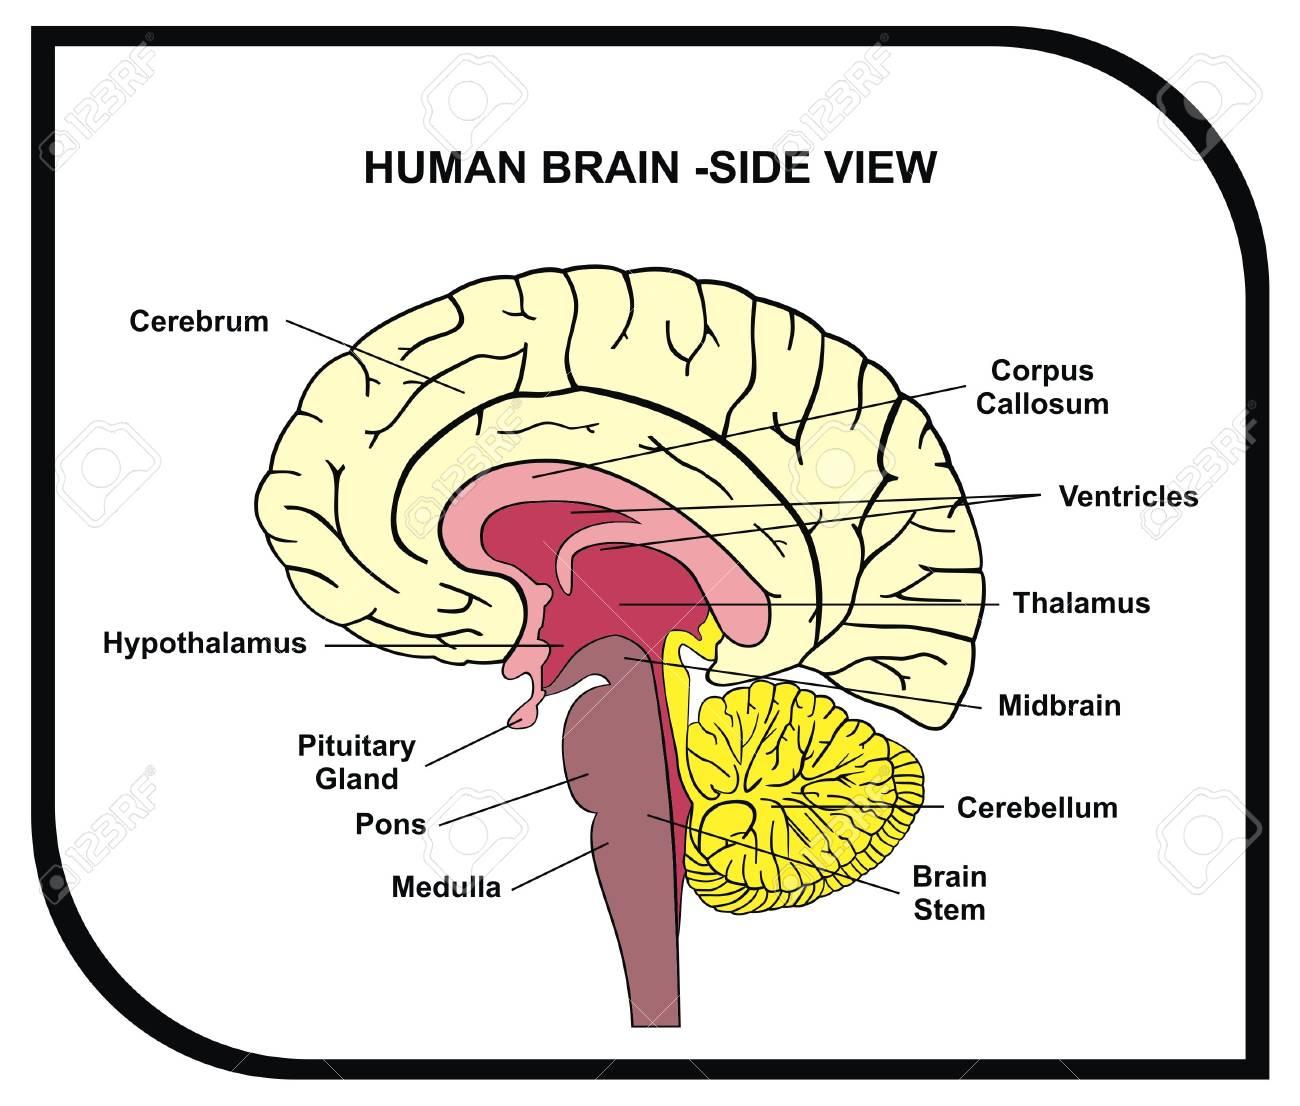 Brain Diagram Labeled Human Skeleton - Electrical Wiring Diagram House •